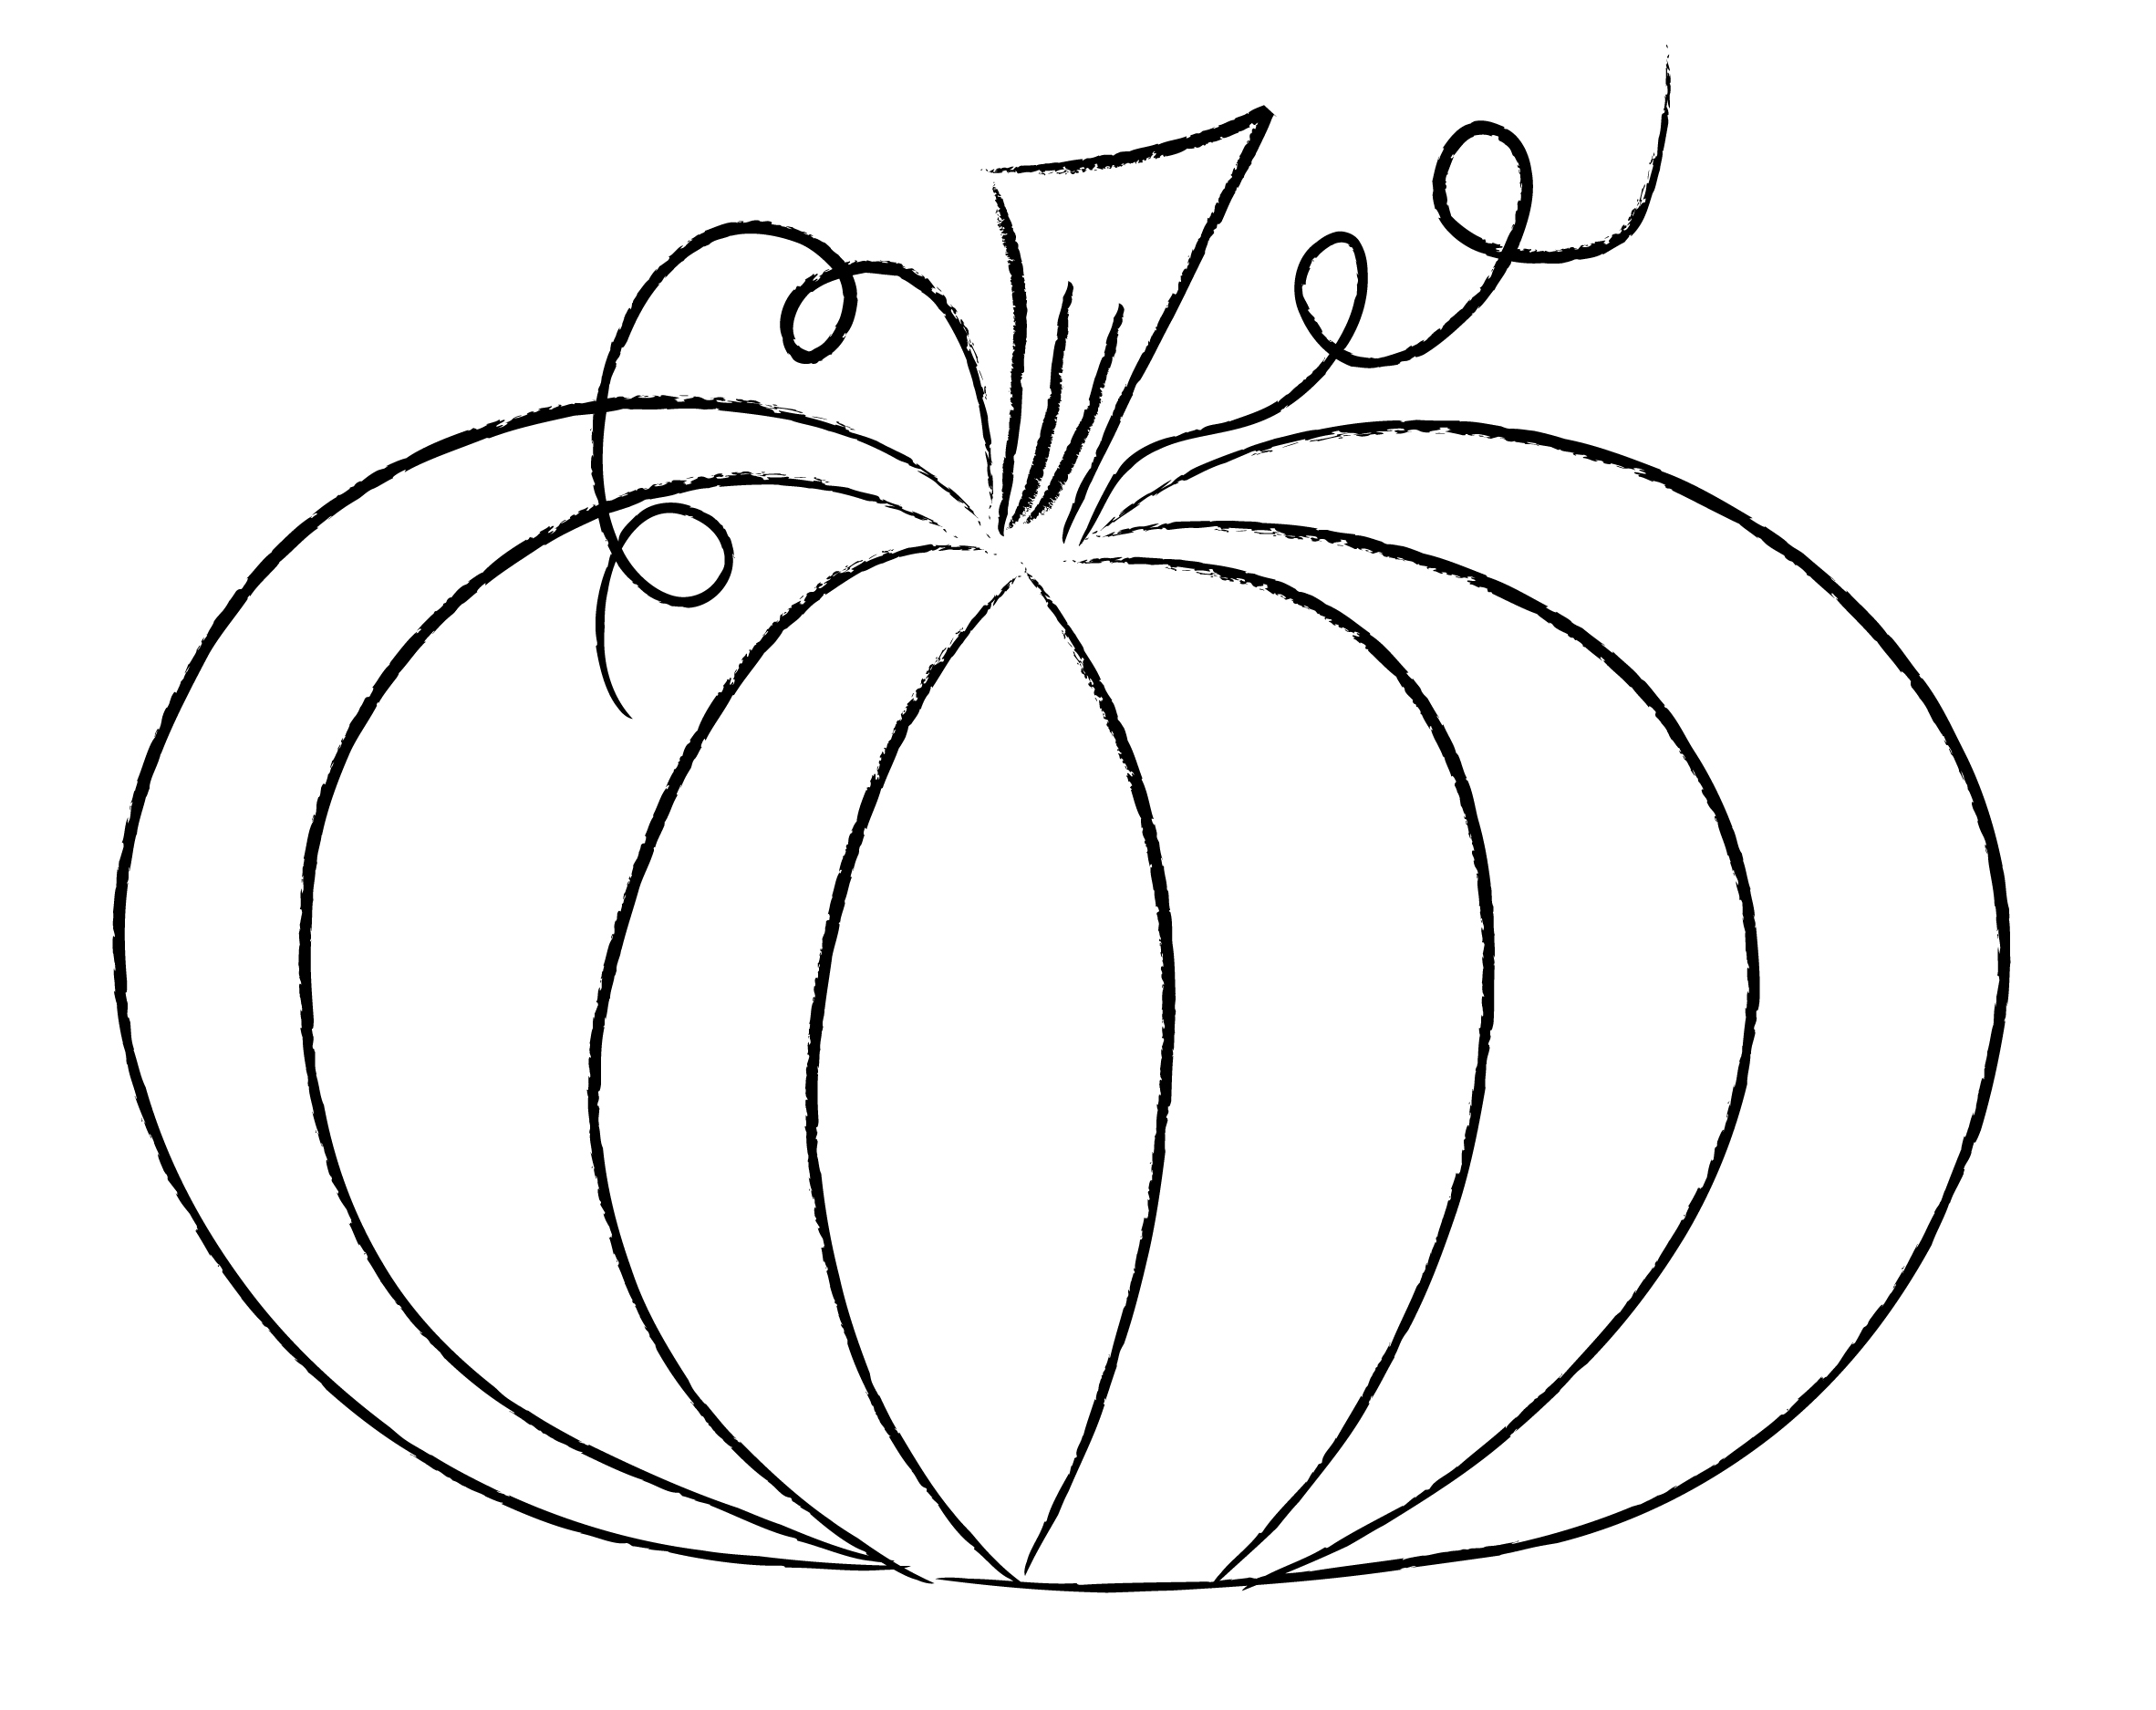 Drawn pumpkin printable Printable Outline Wreath Pumpkin Outline